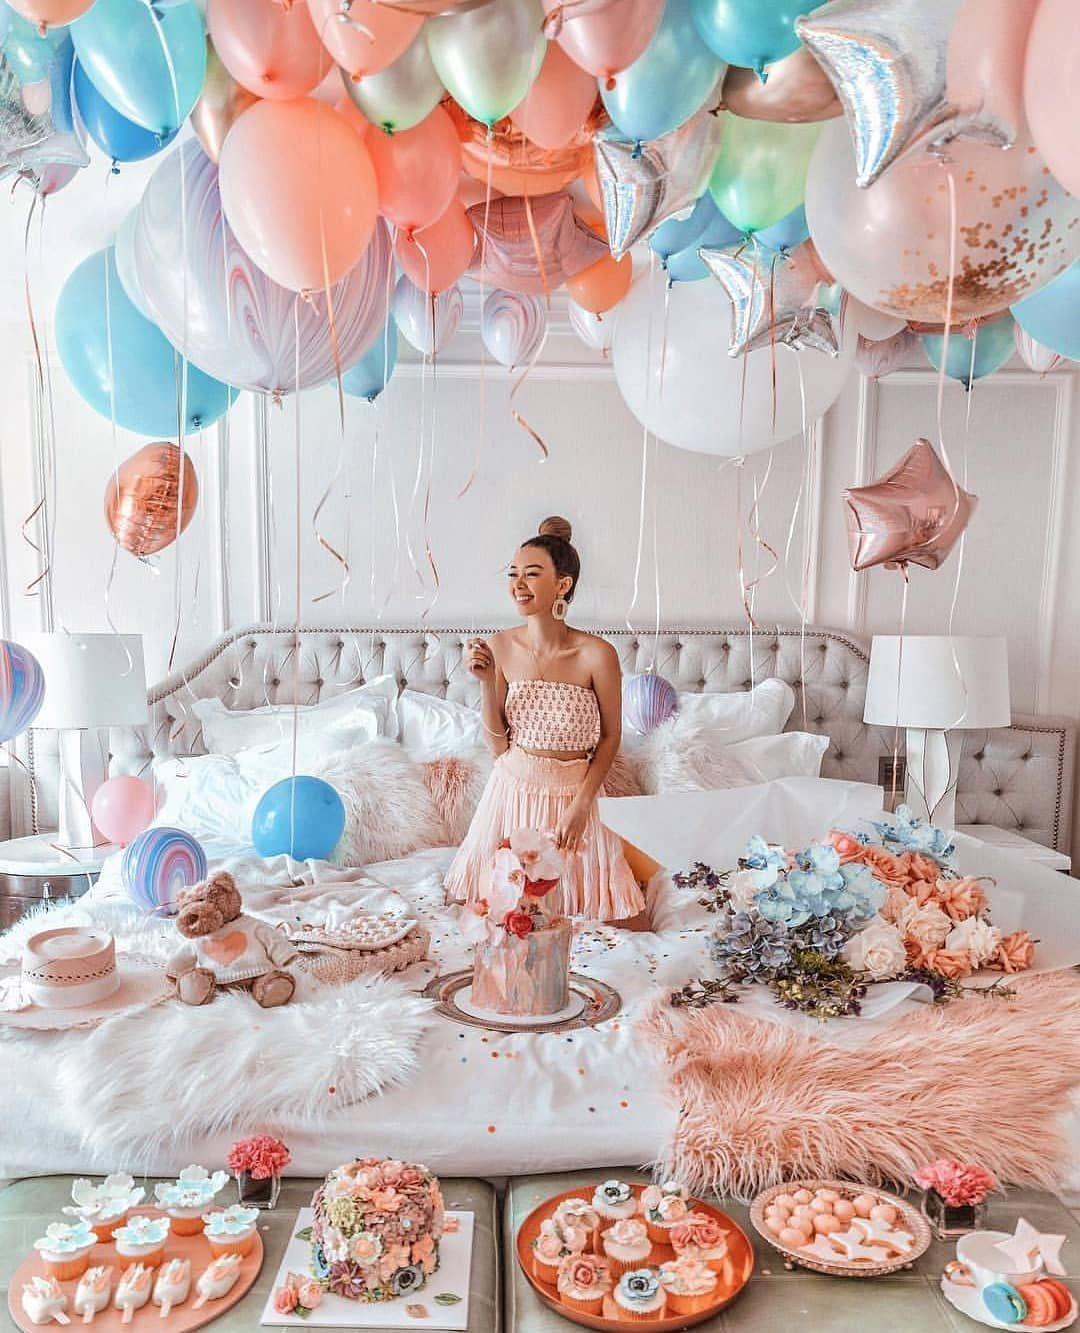 Birthday goals 😍 Yayy? _americanstylist_ Birthday goals